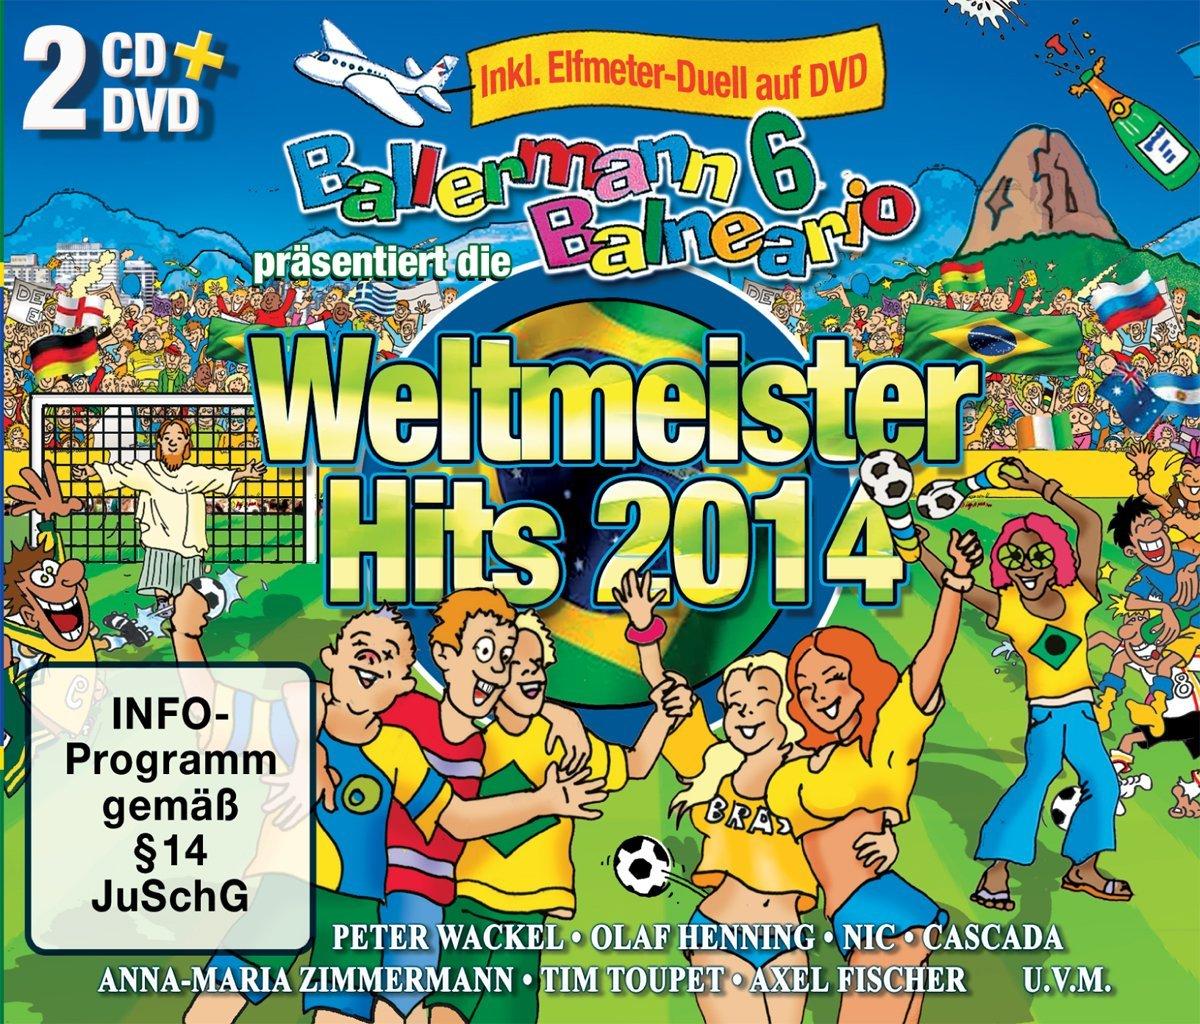 Ballermann 6 – Balneario: Weltmeister Hits 2014 Incl. DVD-Spiel